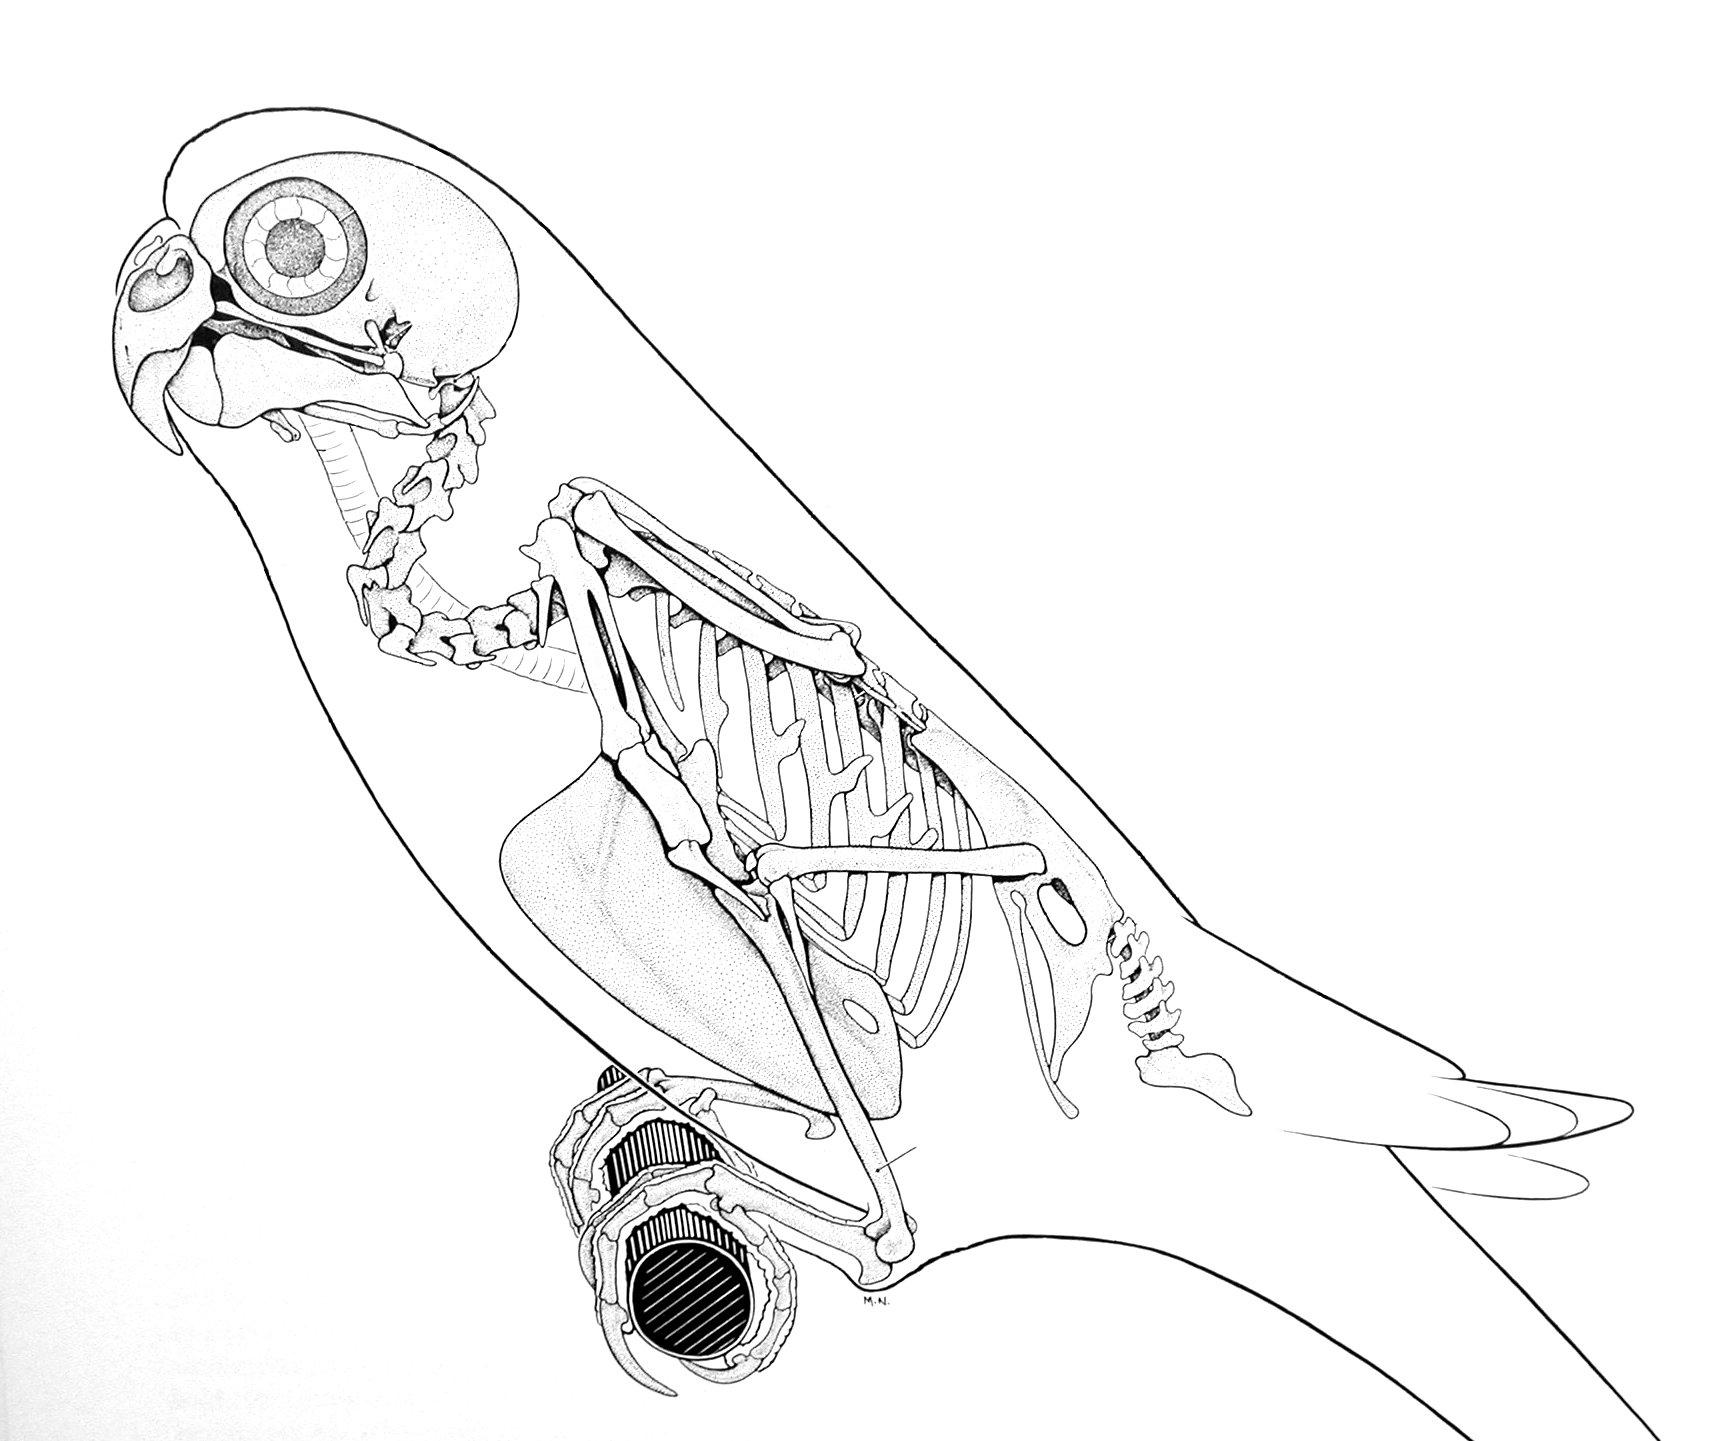 66 best images about Bird Anatomy on Pinterest